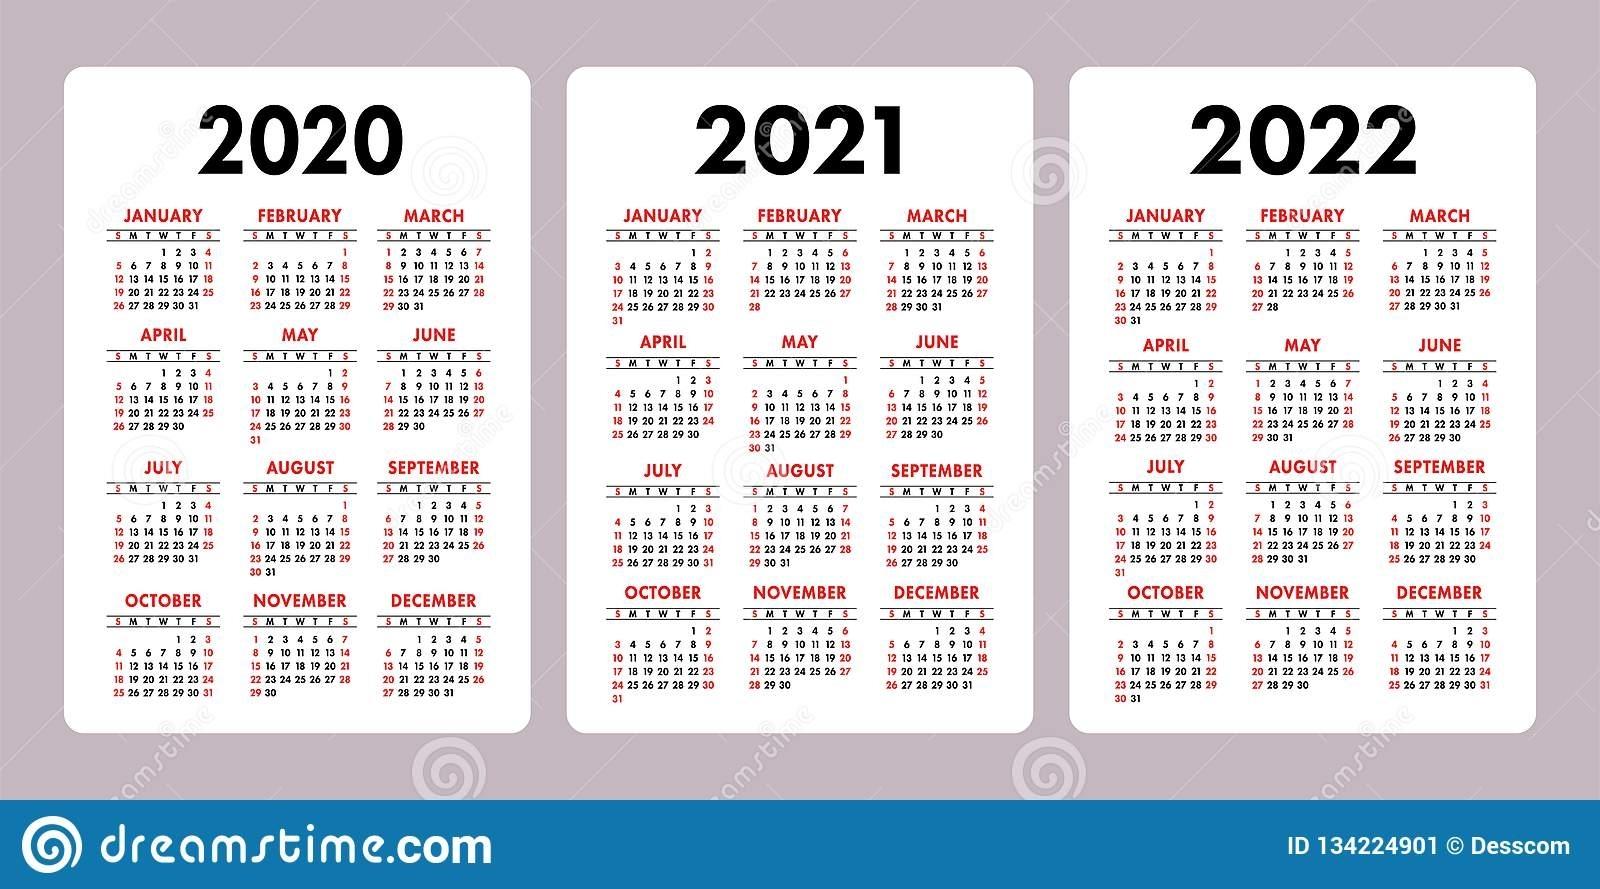 4 Year Calendar 2020 To 2022